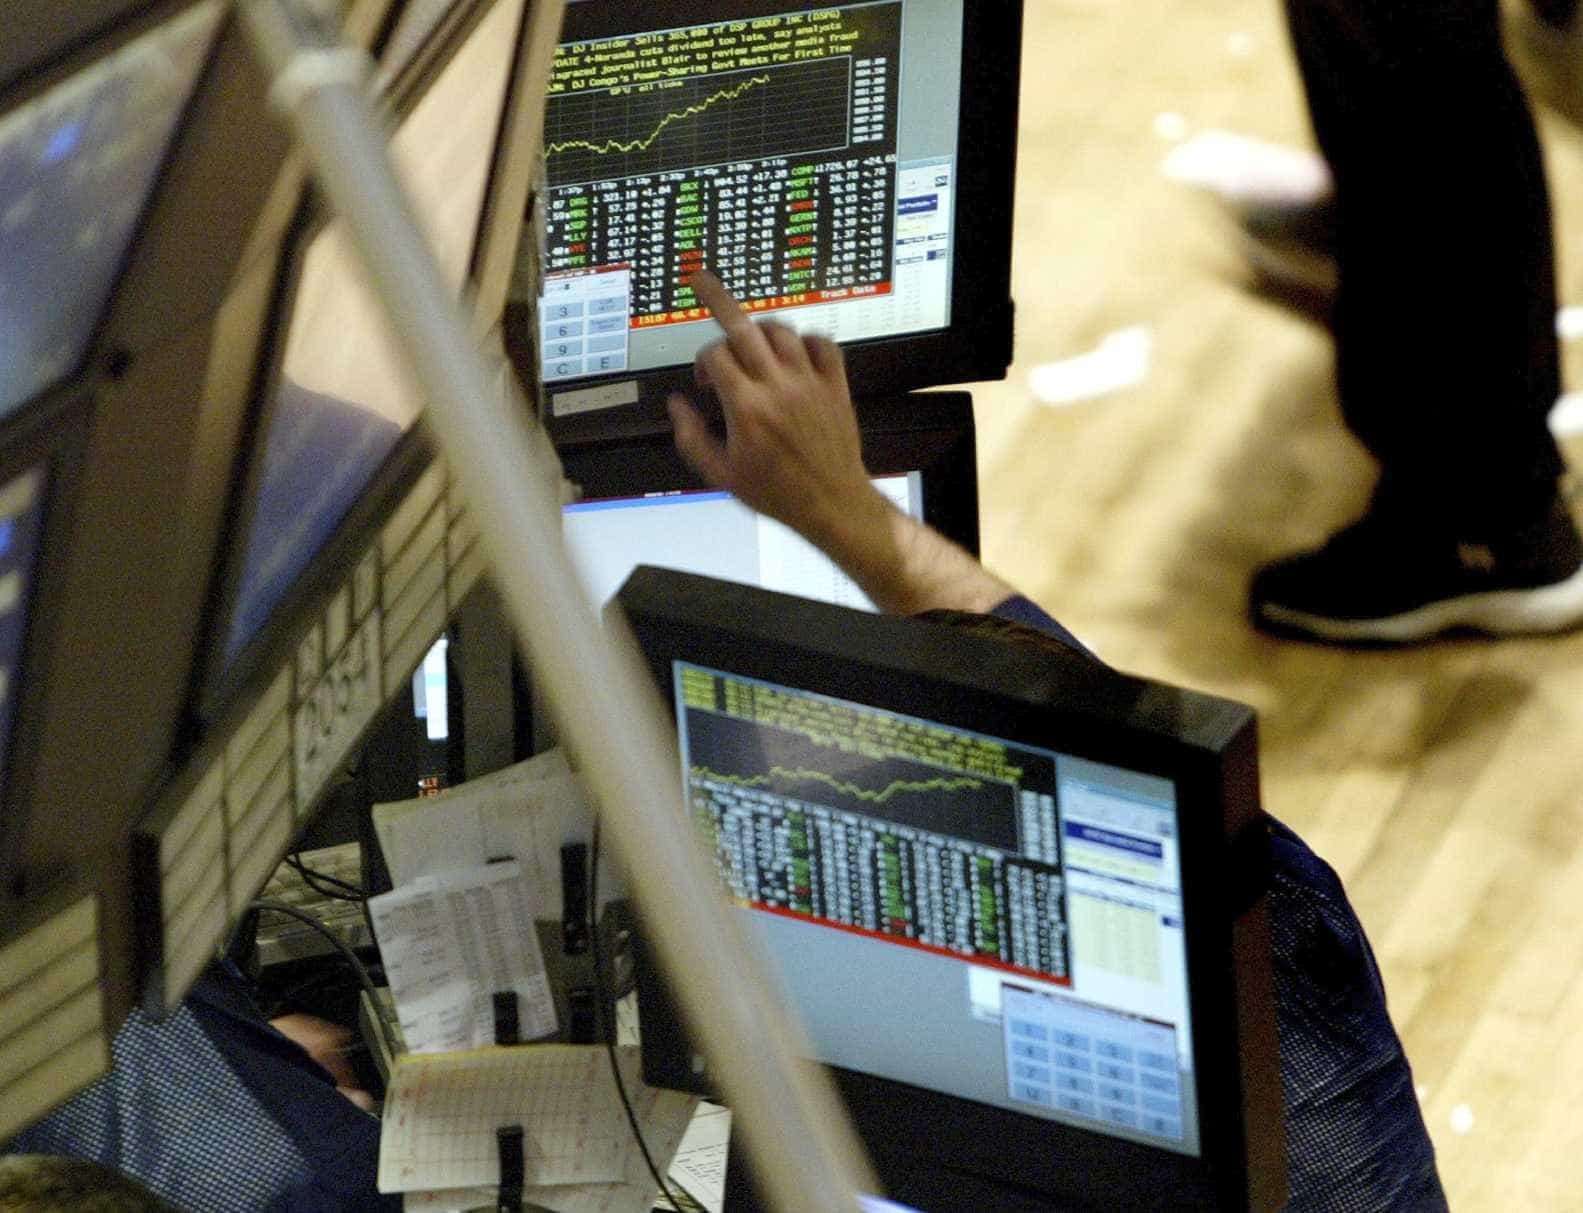 PSI20 cai 2,04%, a descida mais acentuada deste ano